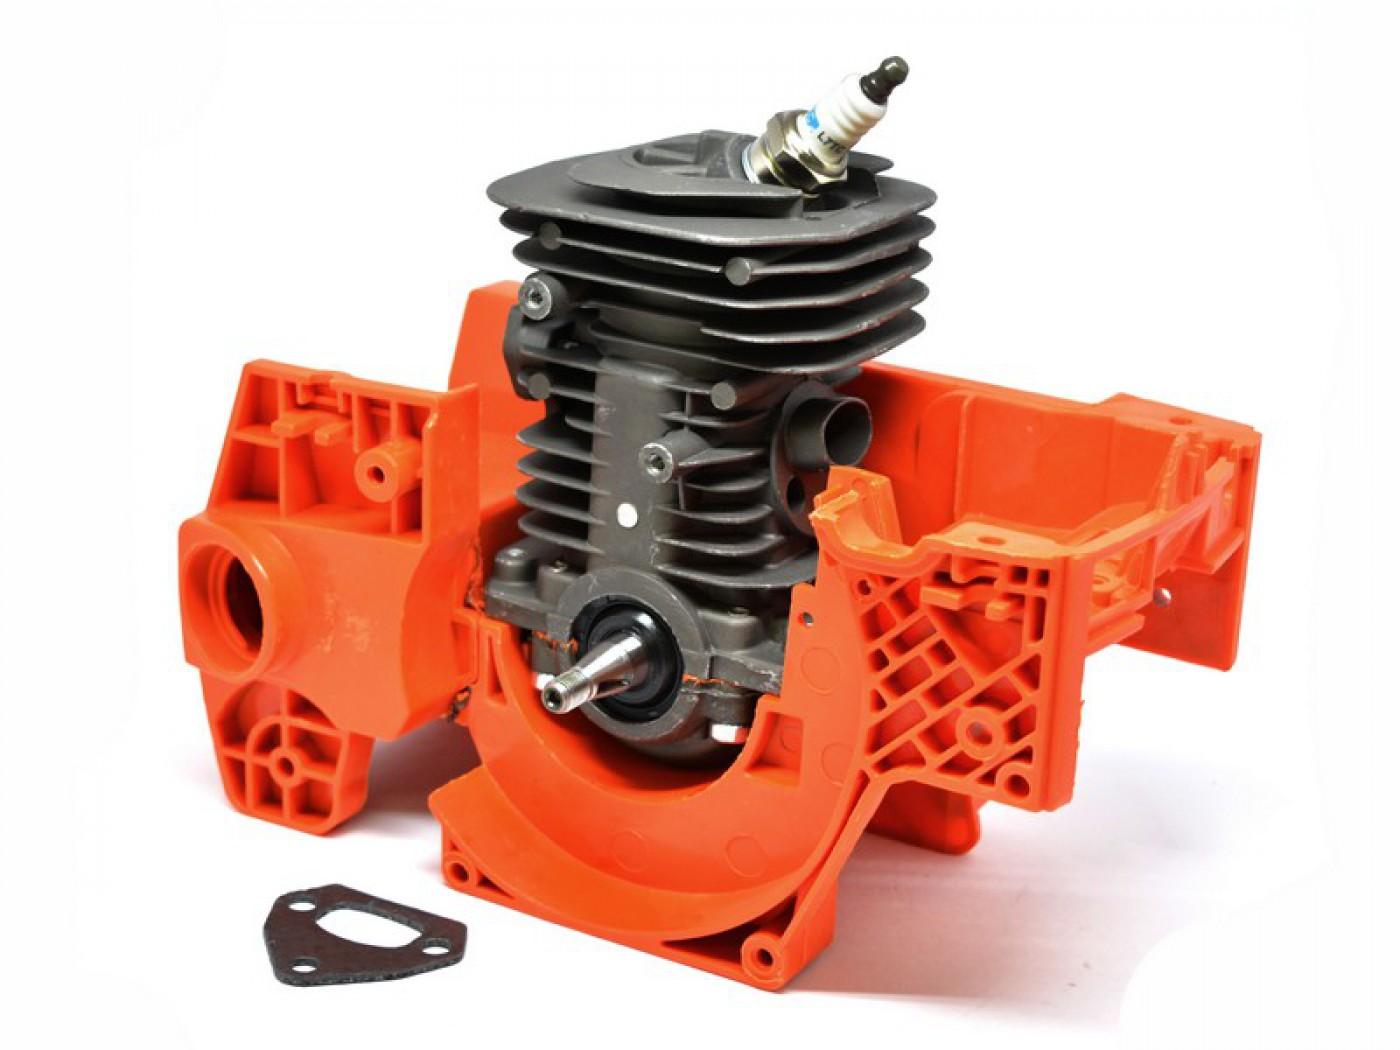 Polomotor HUSQVARNA 136 137 141 142 - Jonsered 2036 2040 25 Eur + kľuková skriňa